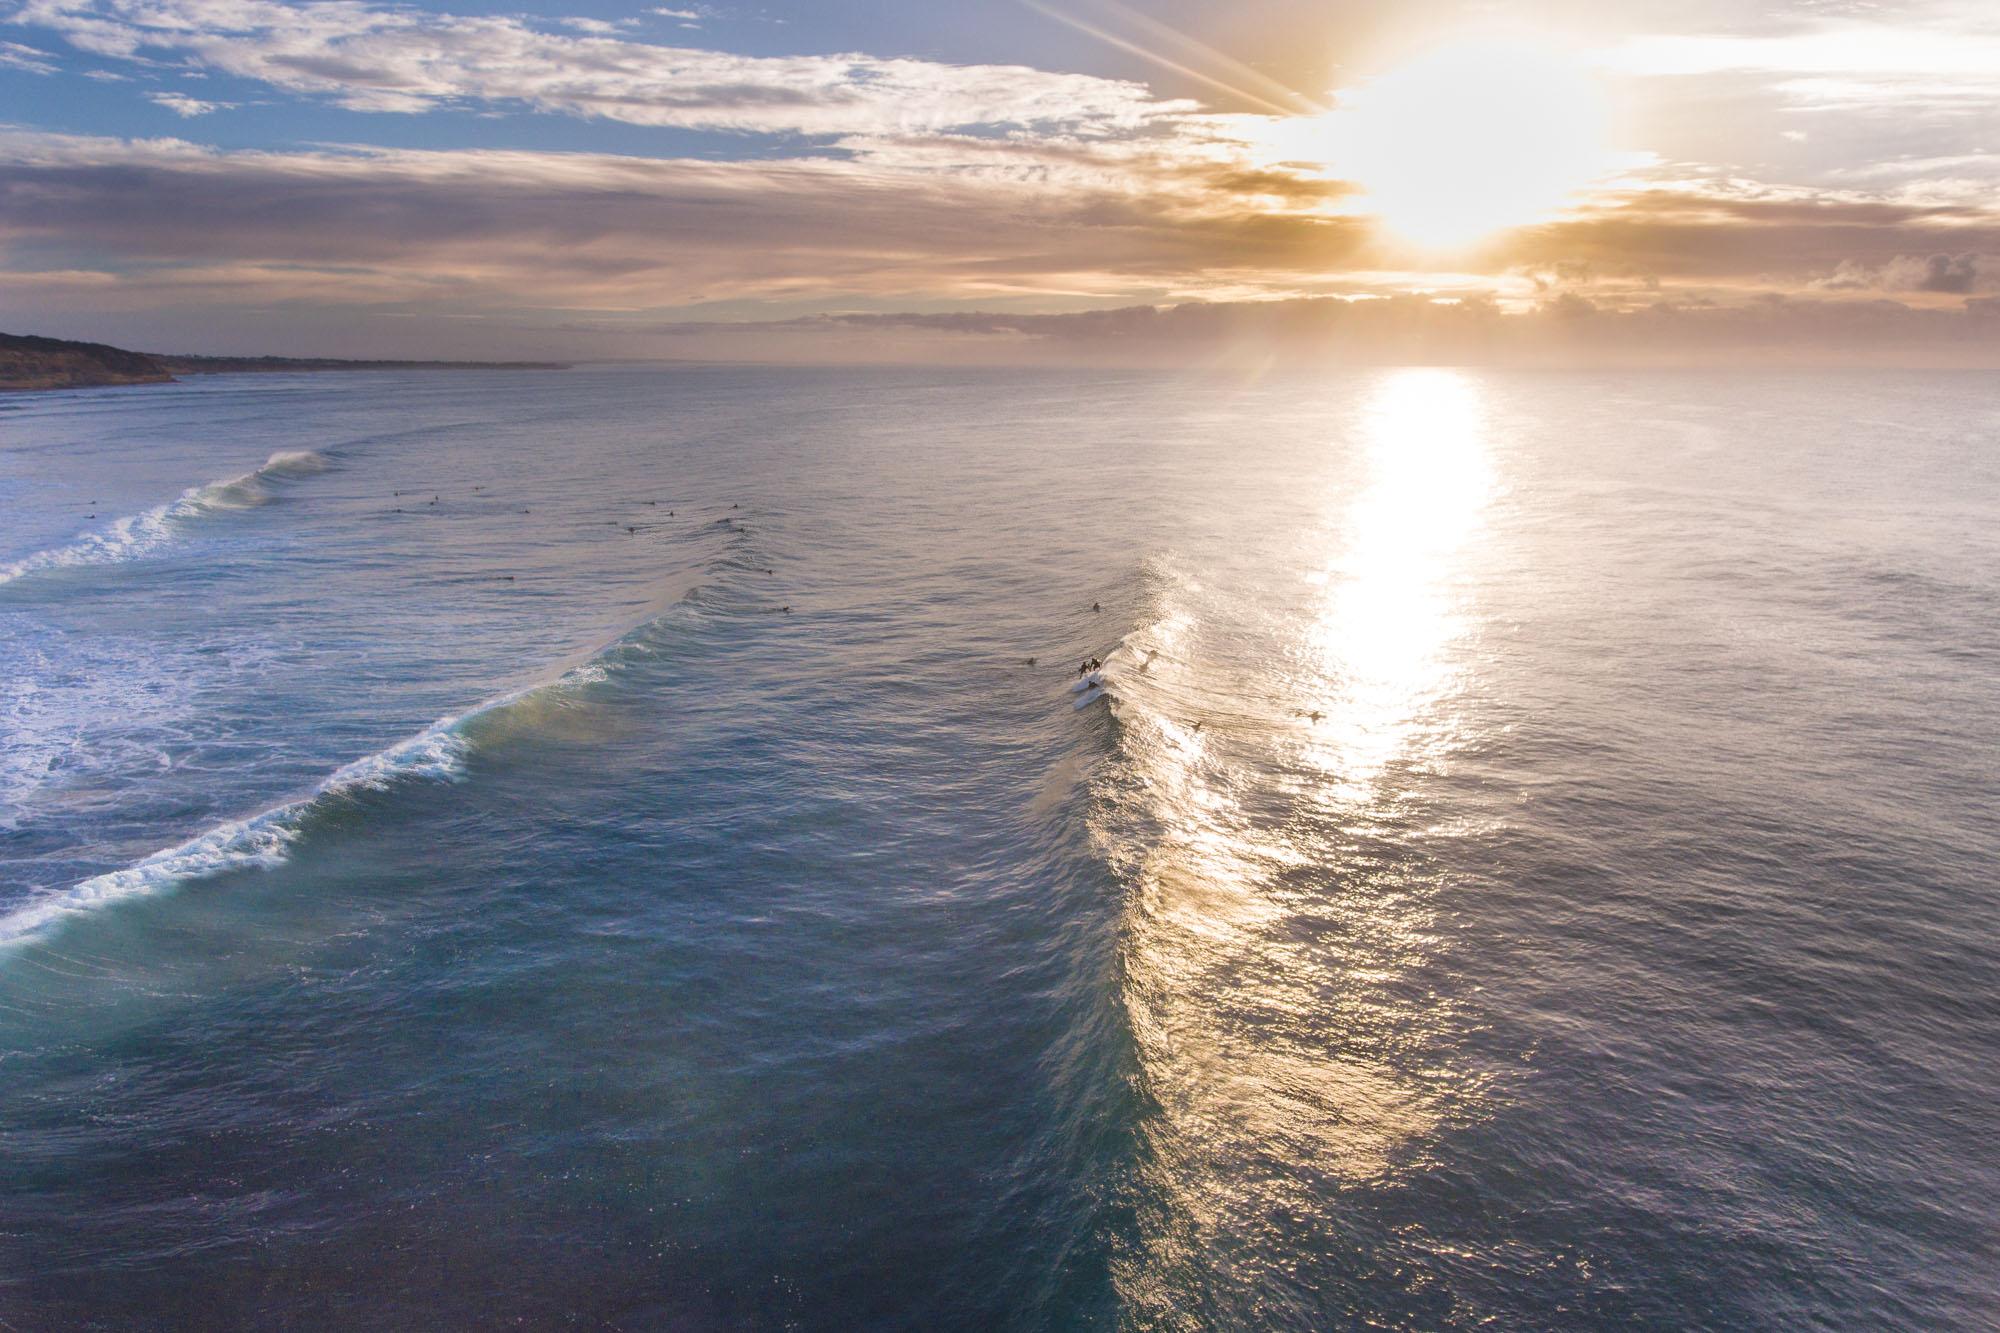 Bells Beach Surf Break